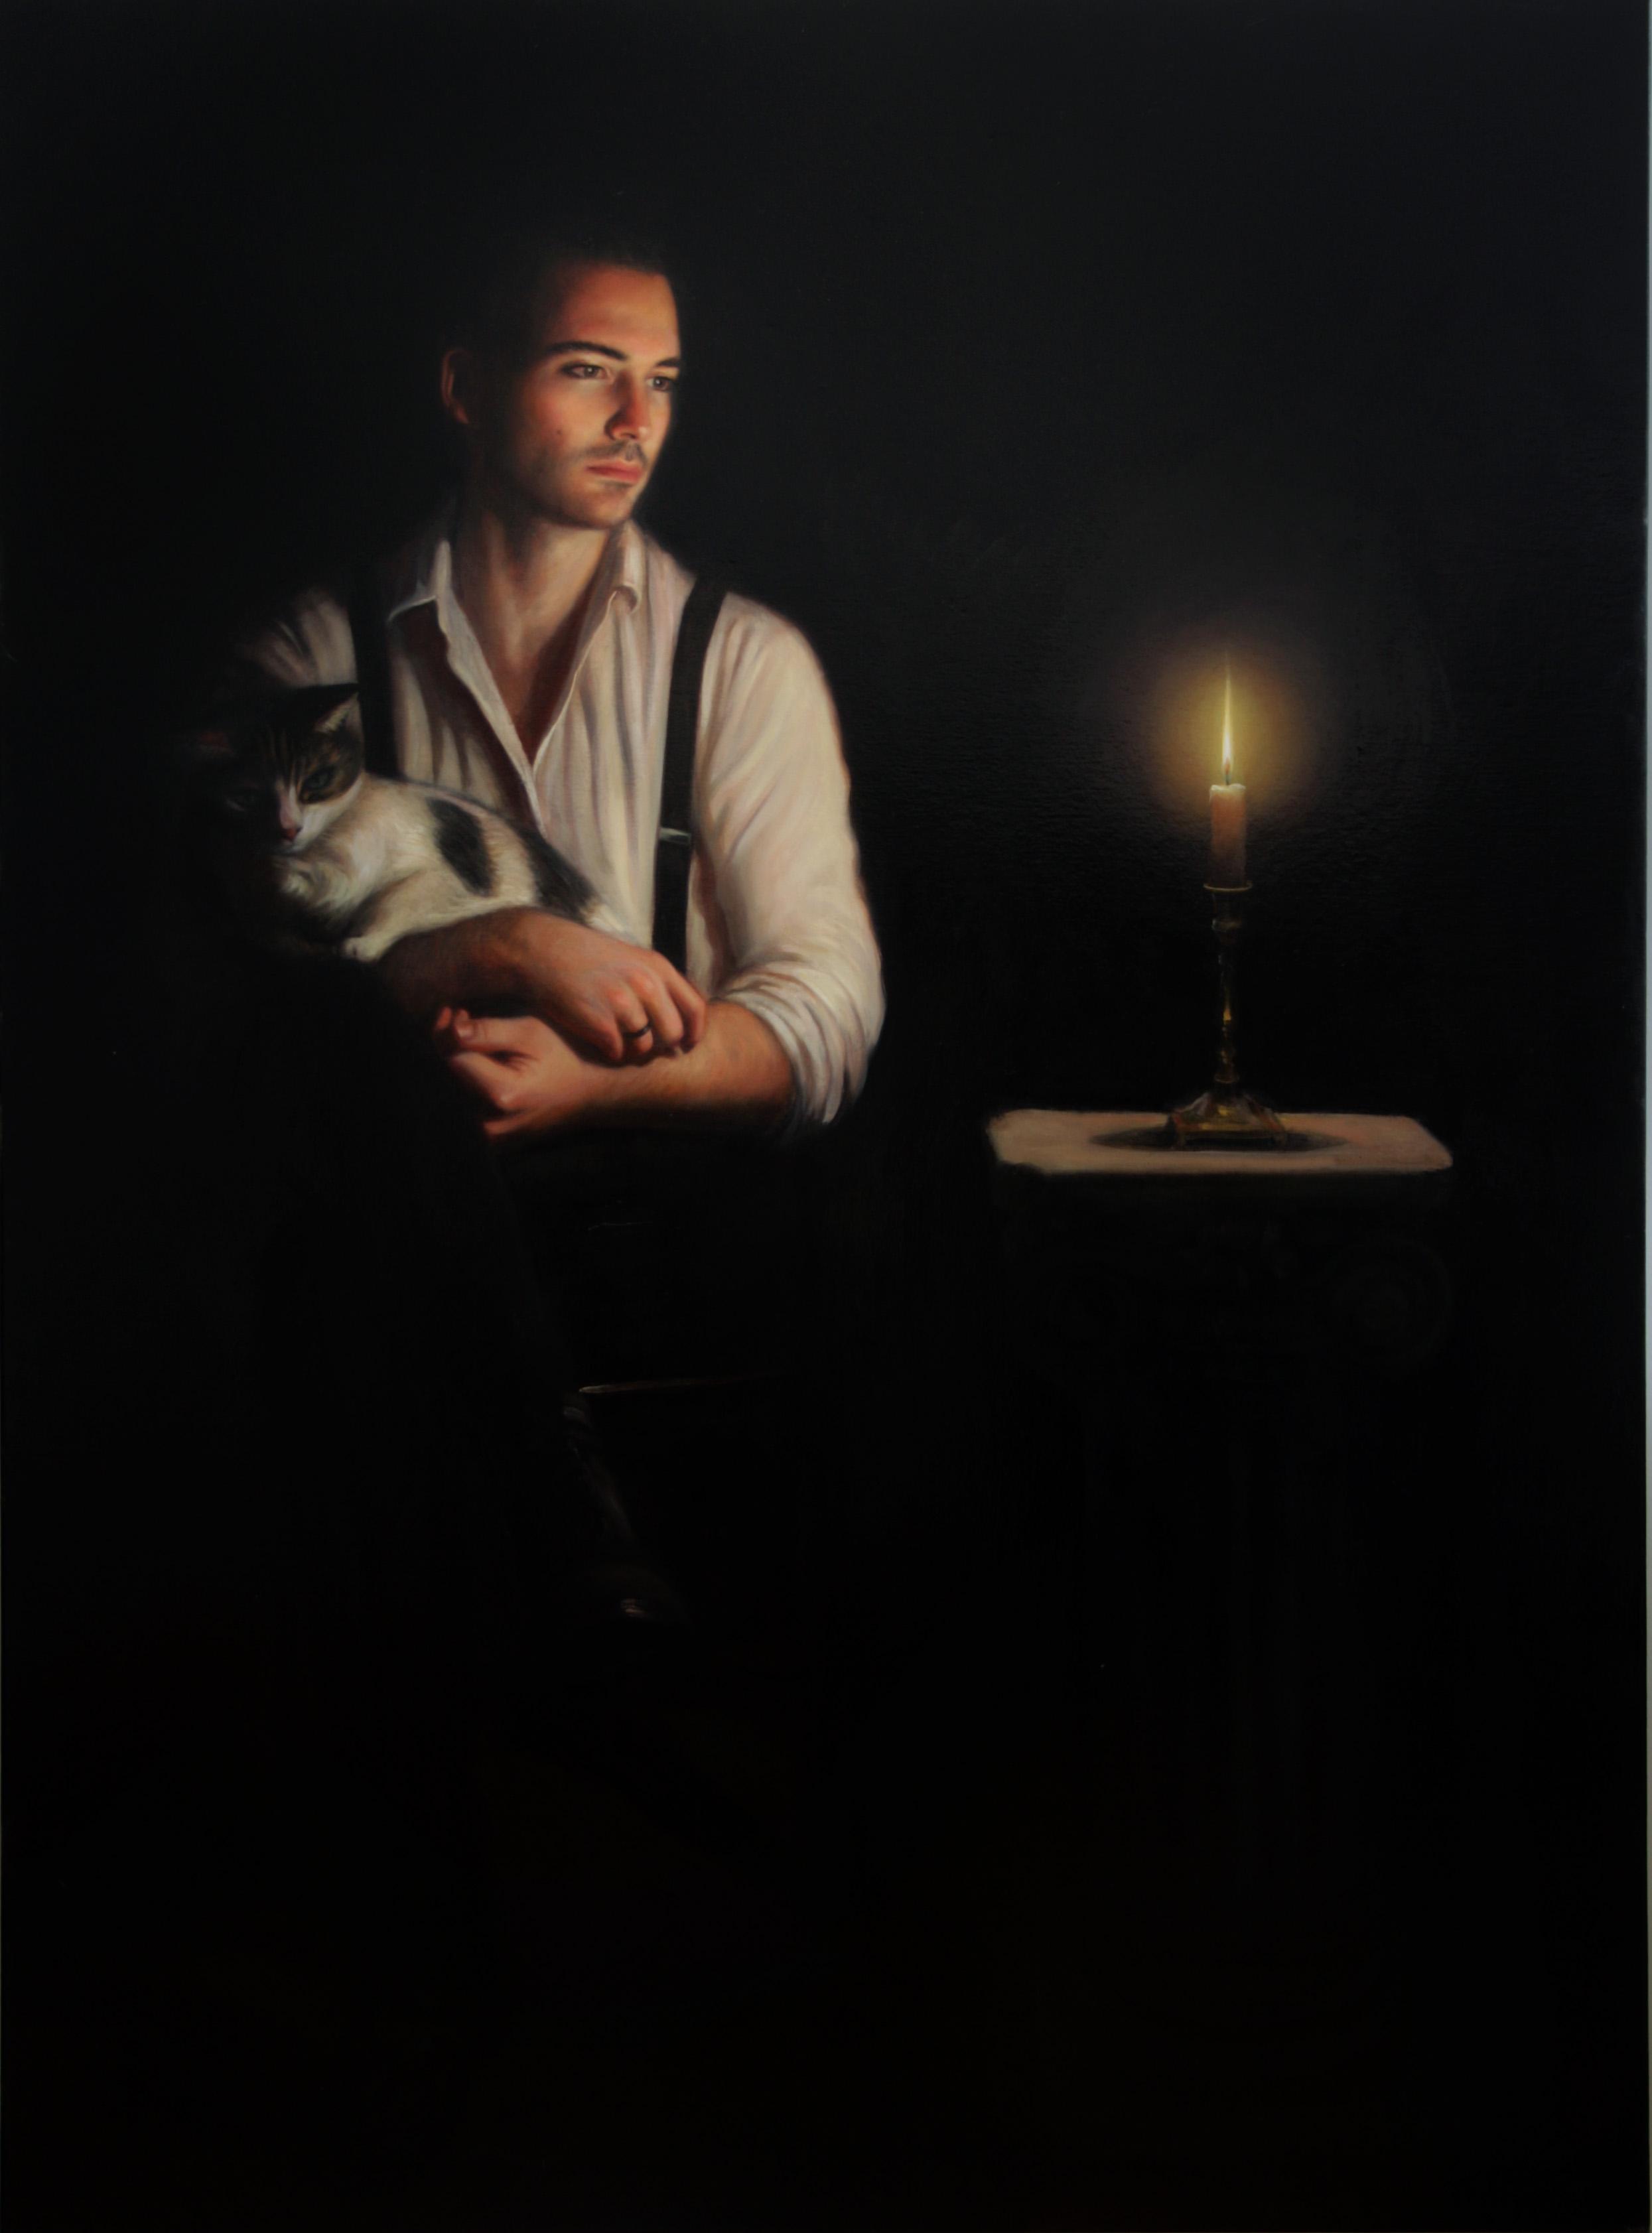 TM Davy, 'Self' 2012. Courtesy the artist